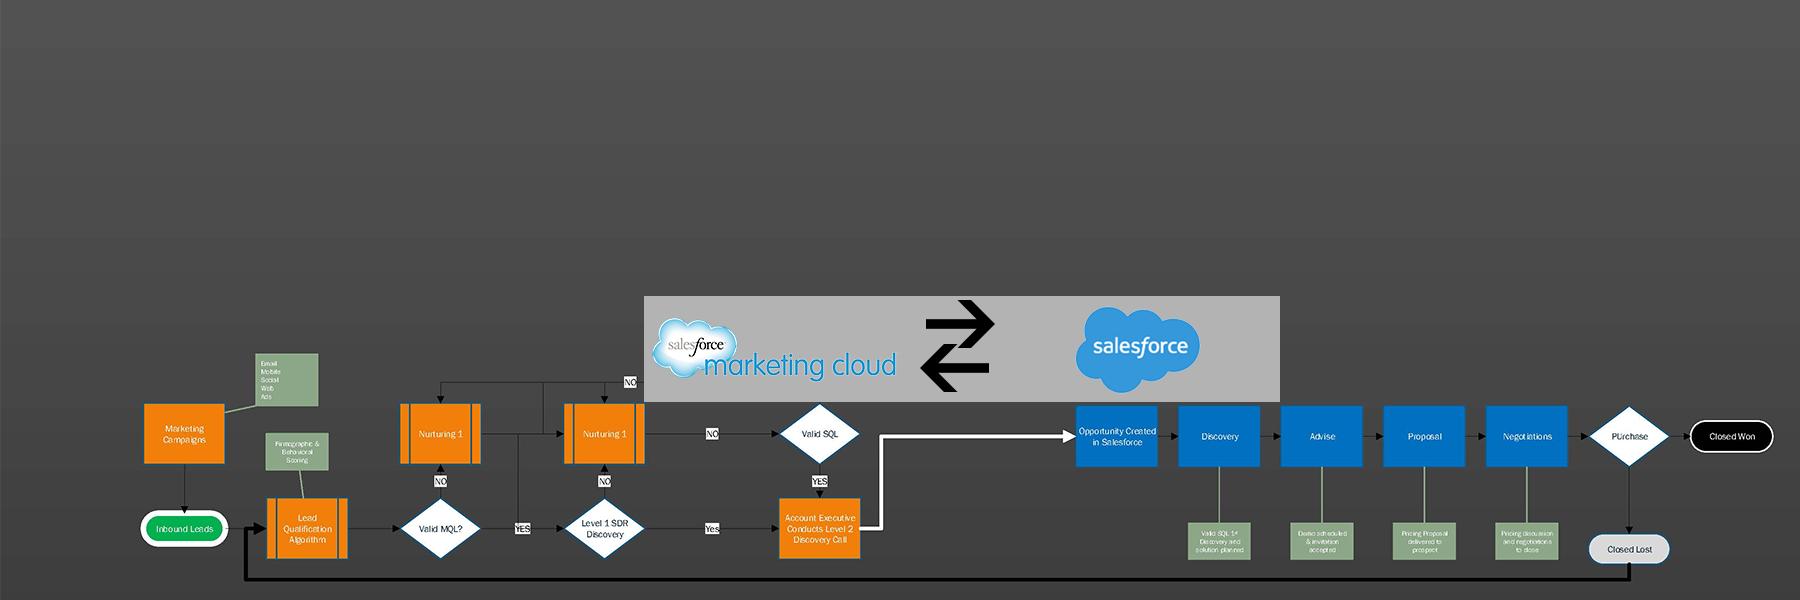 Directory-Page-Main-image-M-Cloud-version